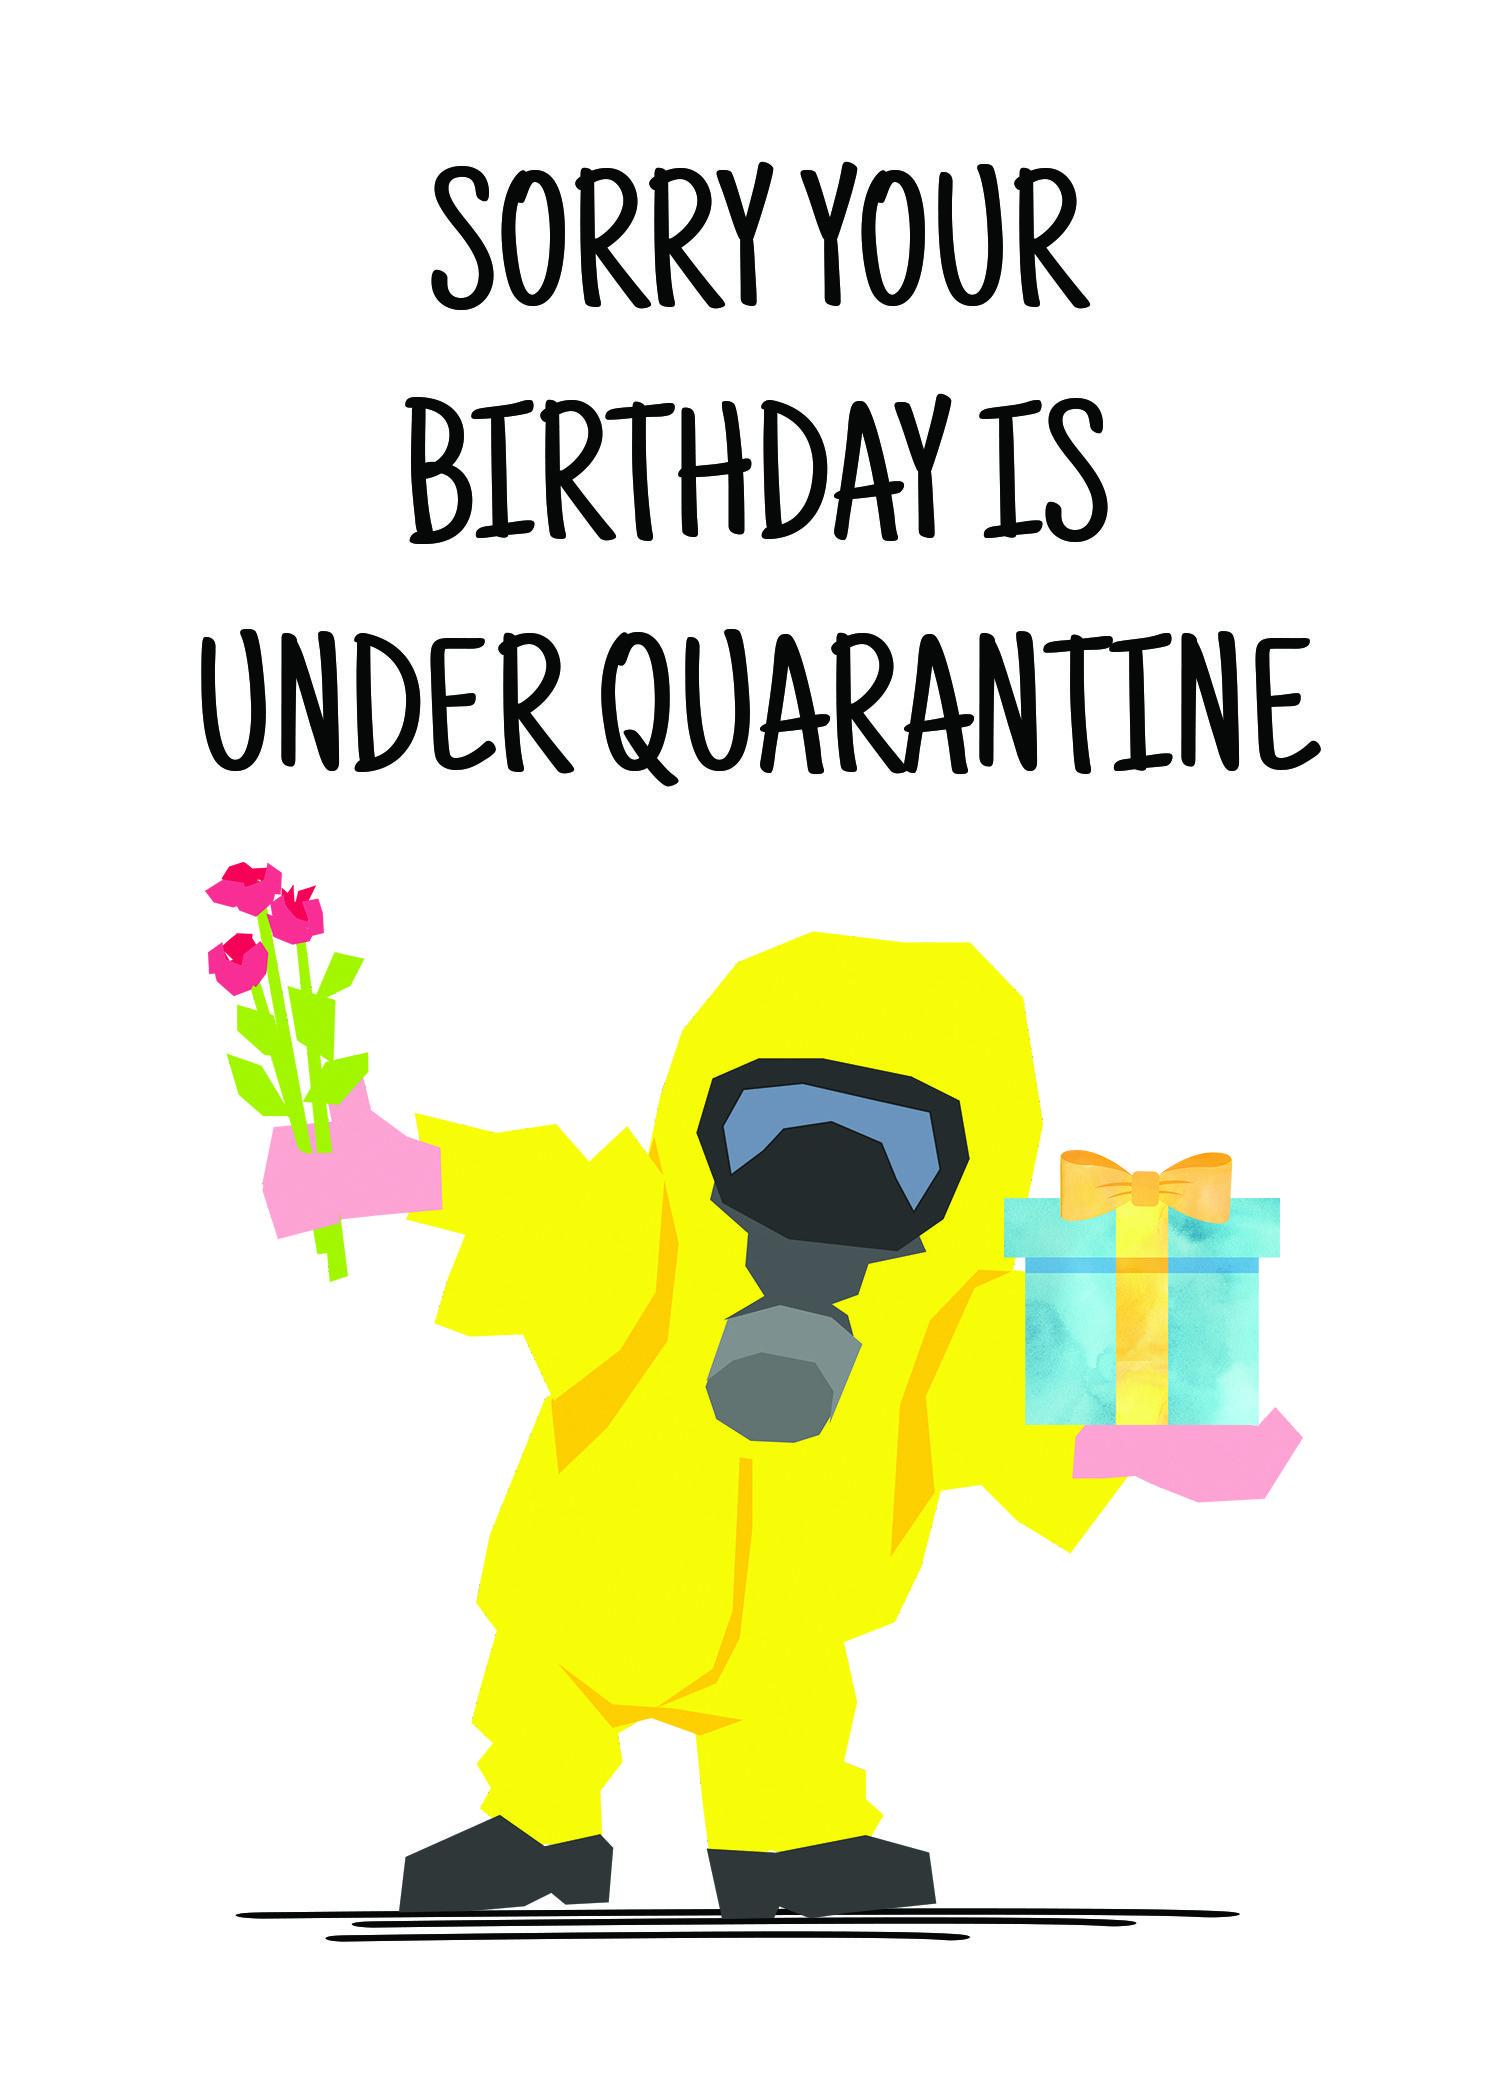 Quarantine Birthday Card - Sorry Your Birthday Is Under Quarantine